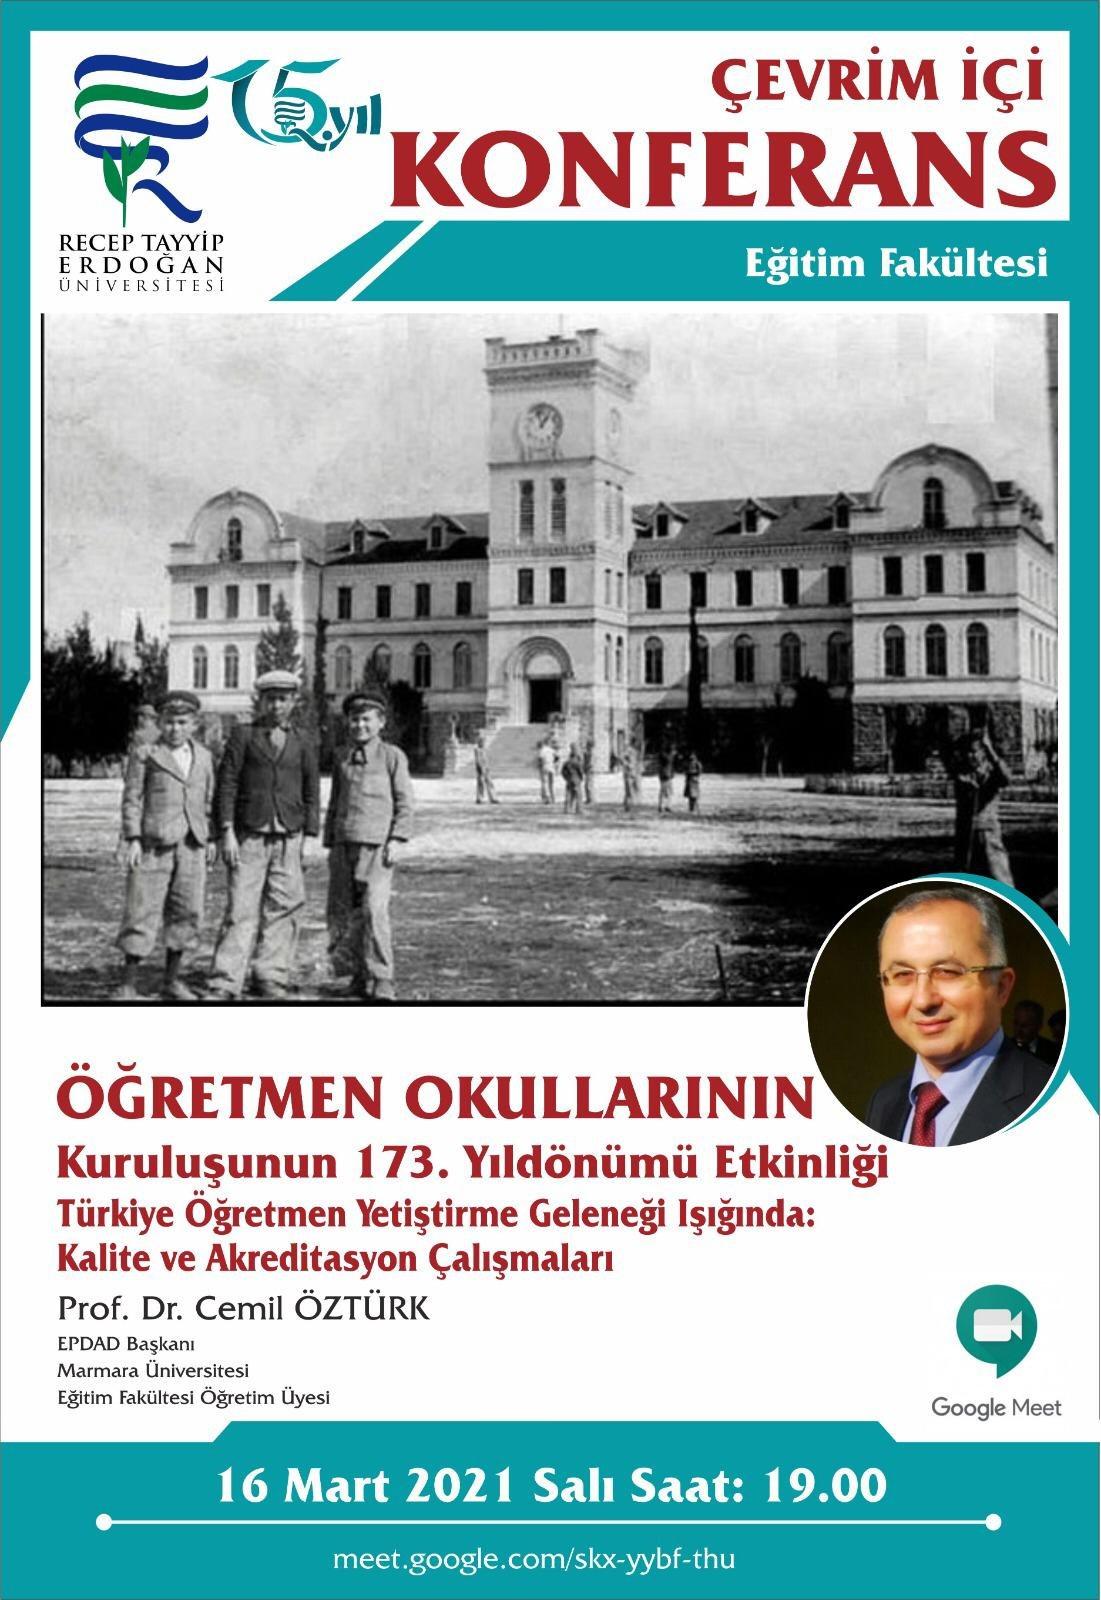 EPDAD Başkanı Prof. Dr. Cemil Öztürk